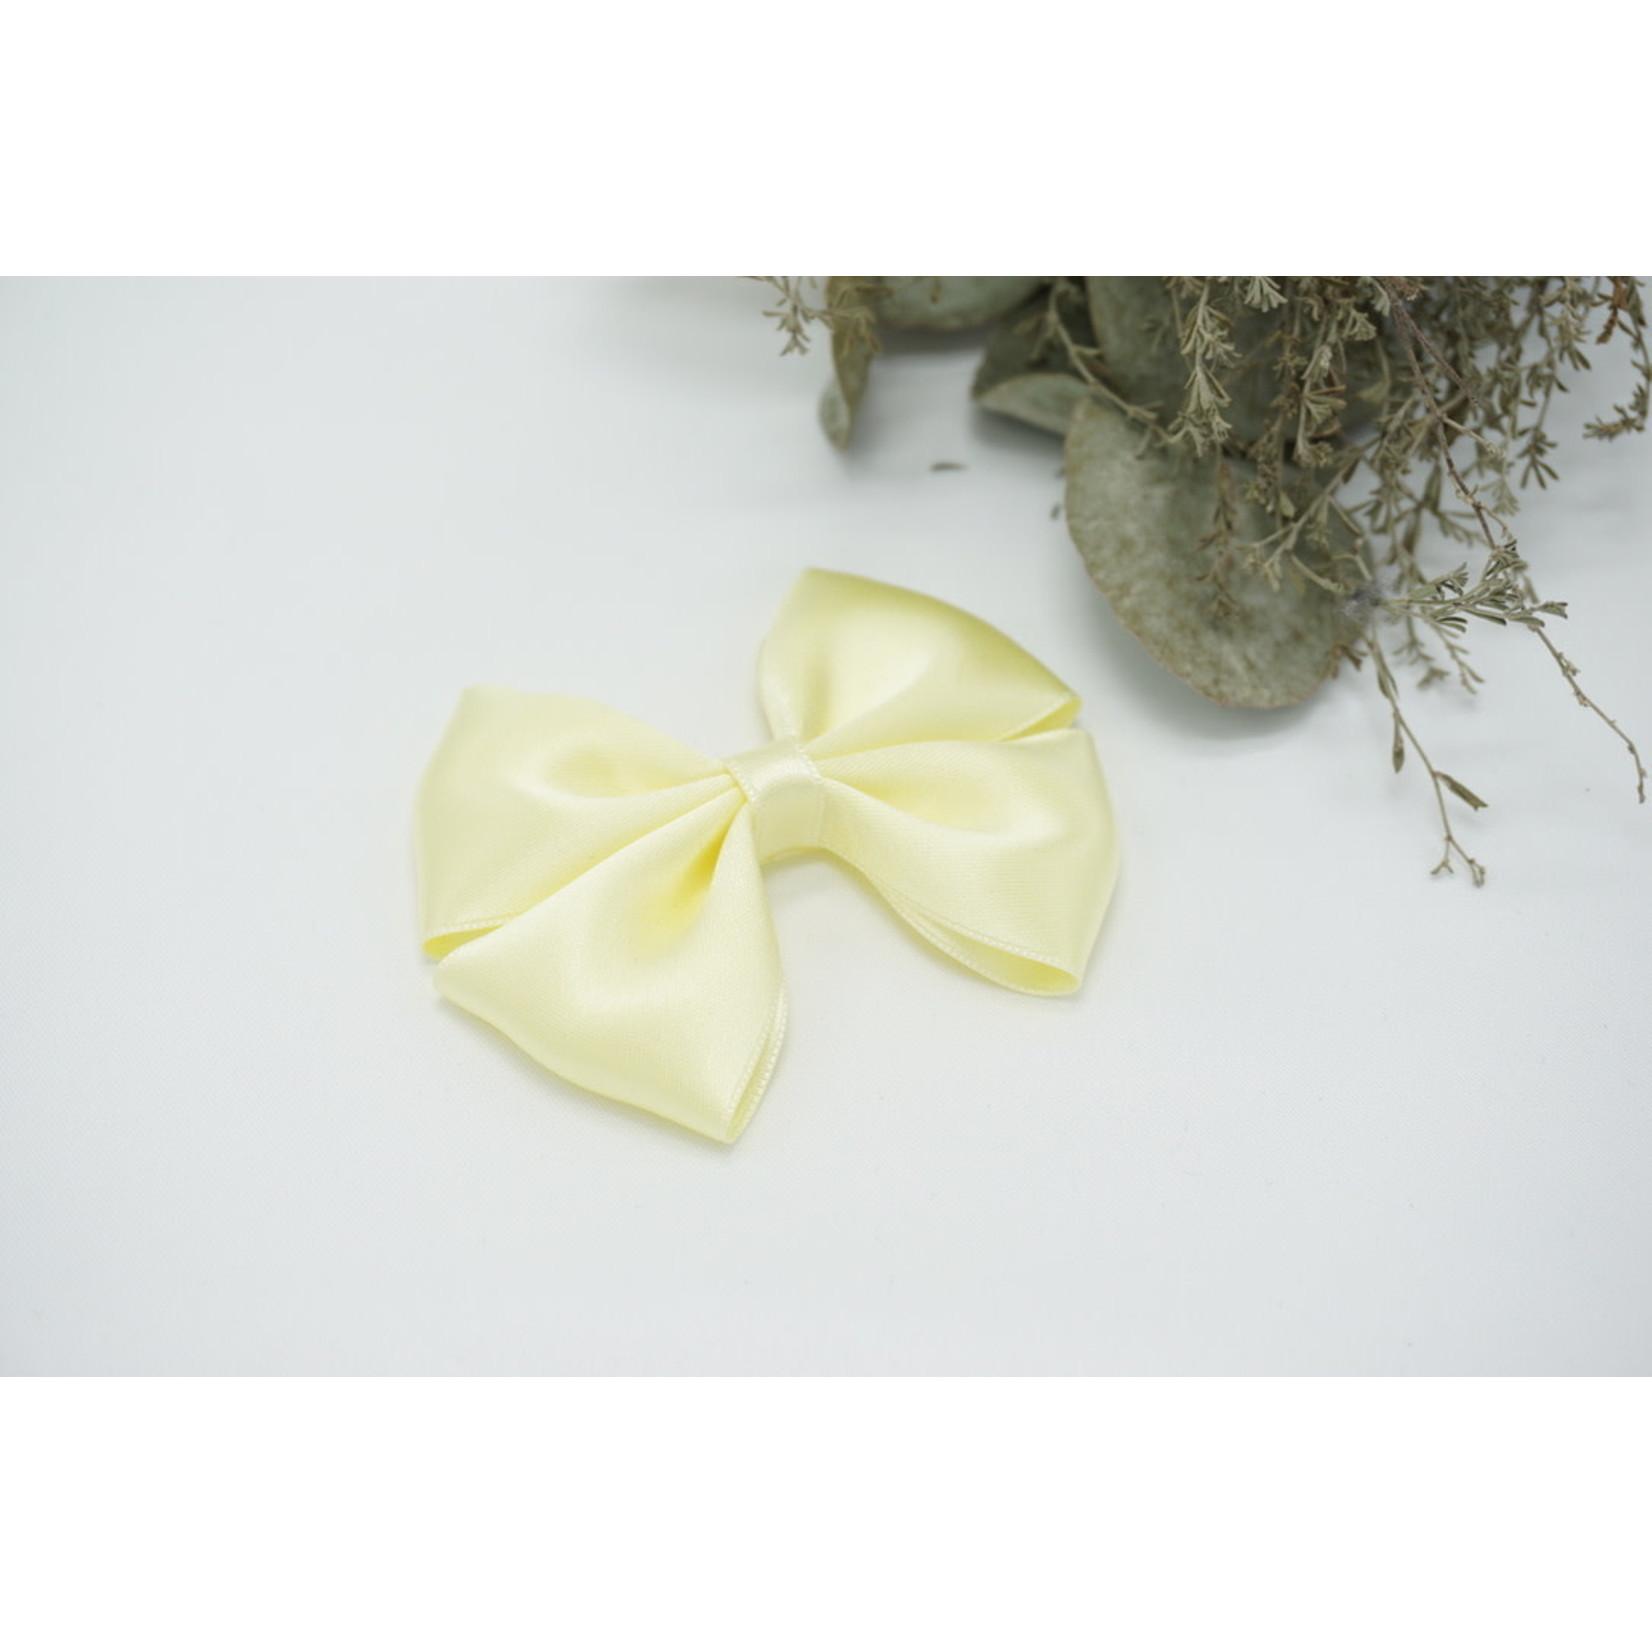 Petite Zara Satin Bow - Light Yellow